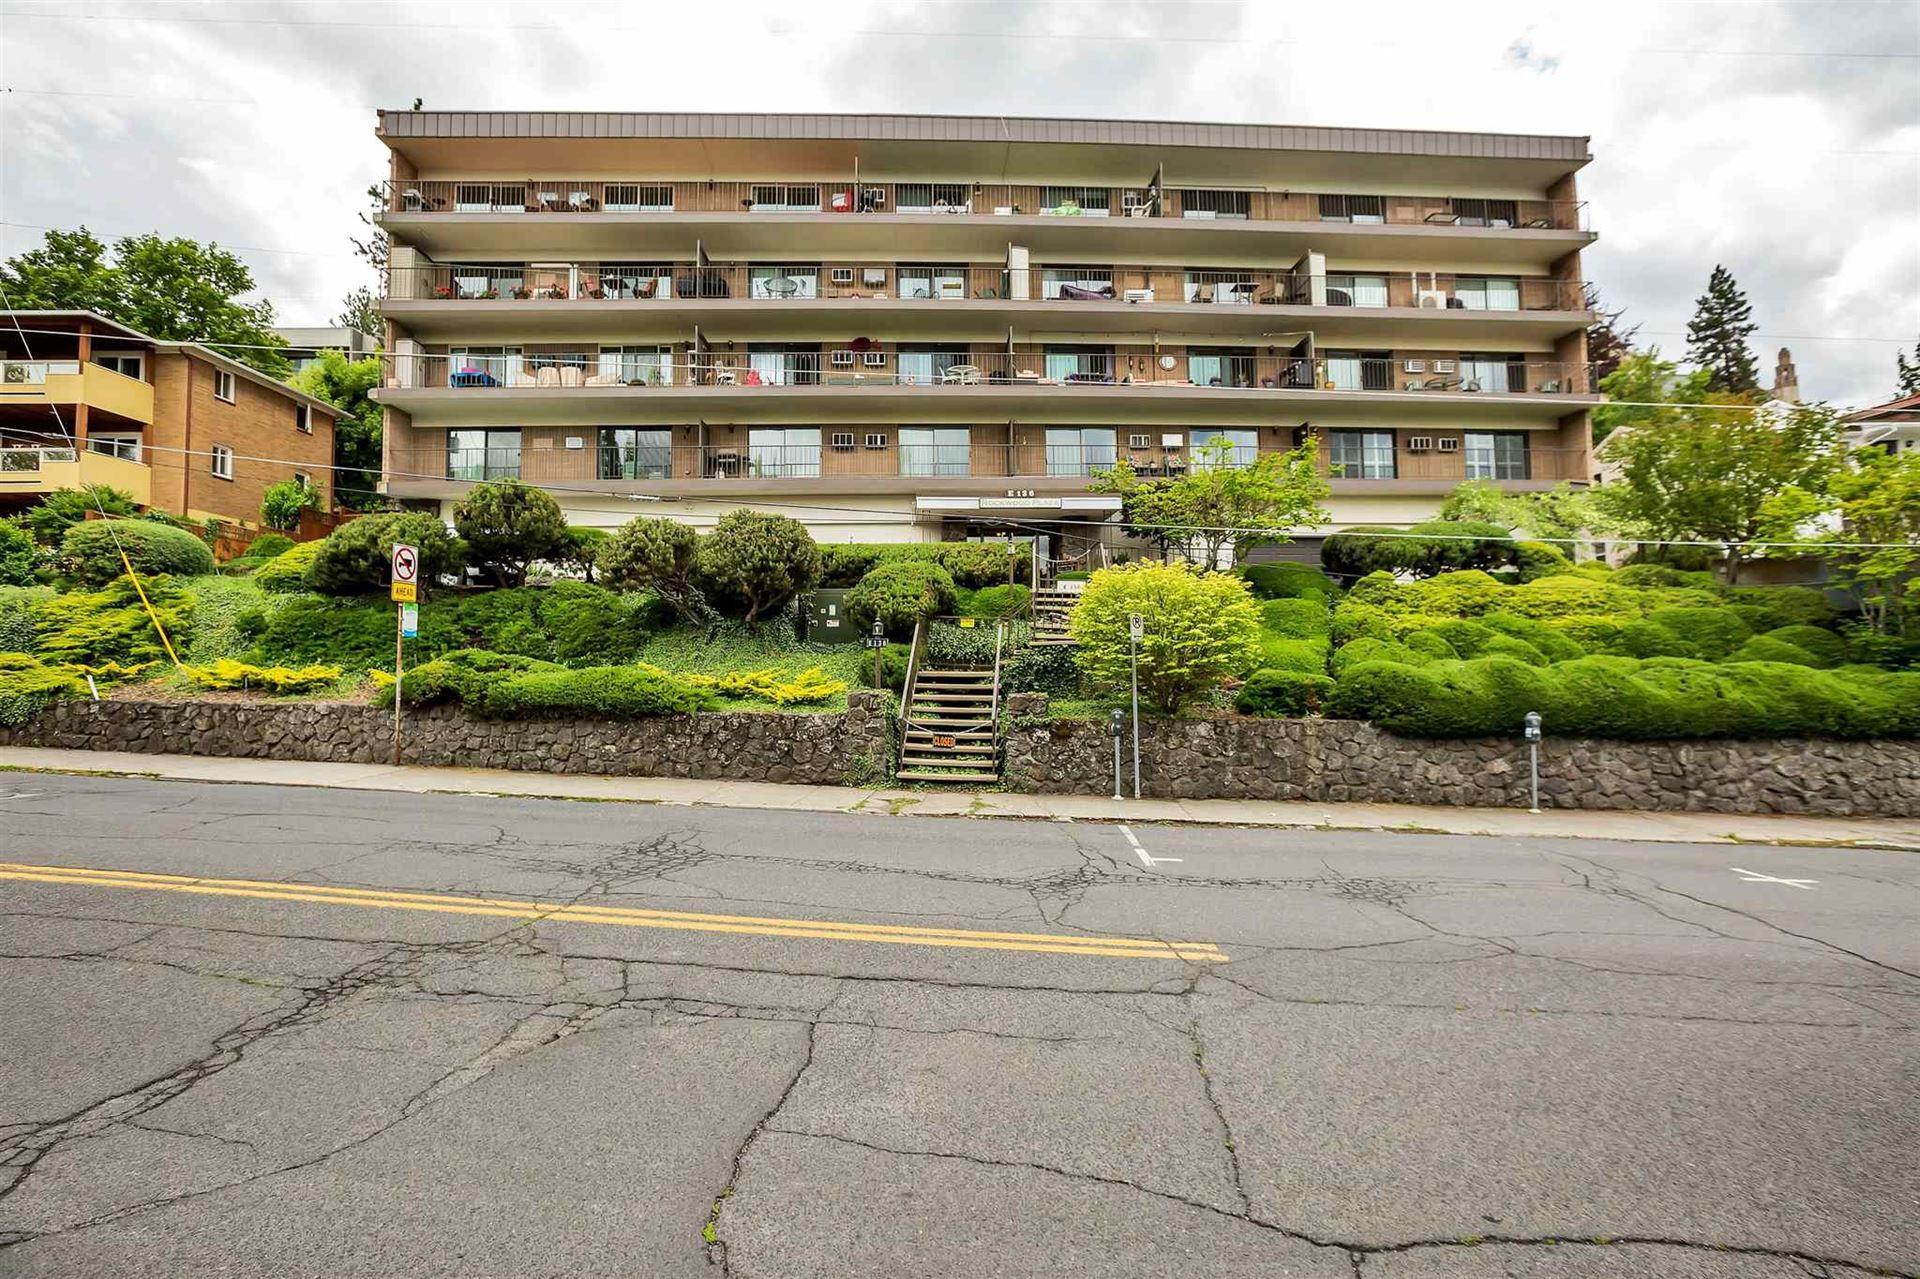 136 E Rockwood Blvd #204, Spokane, WA 99202 - #: 202117412